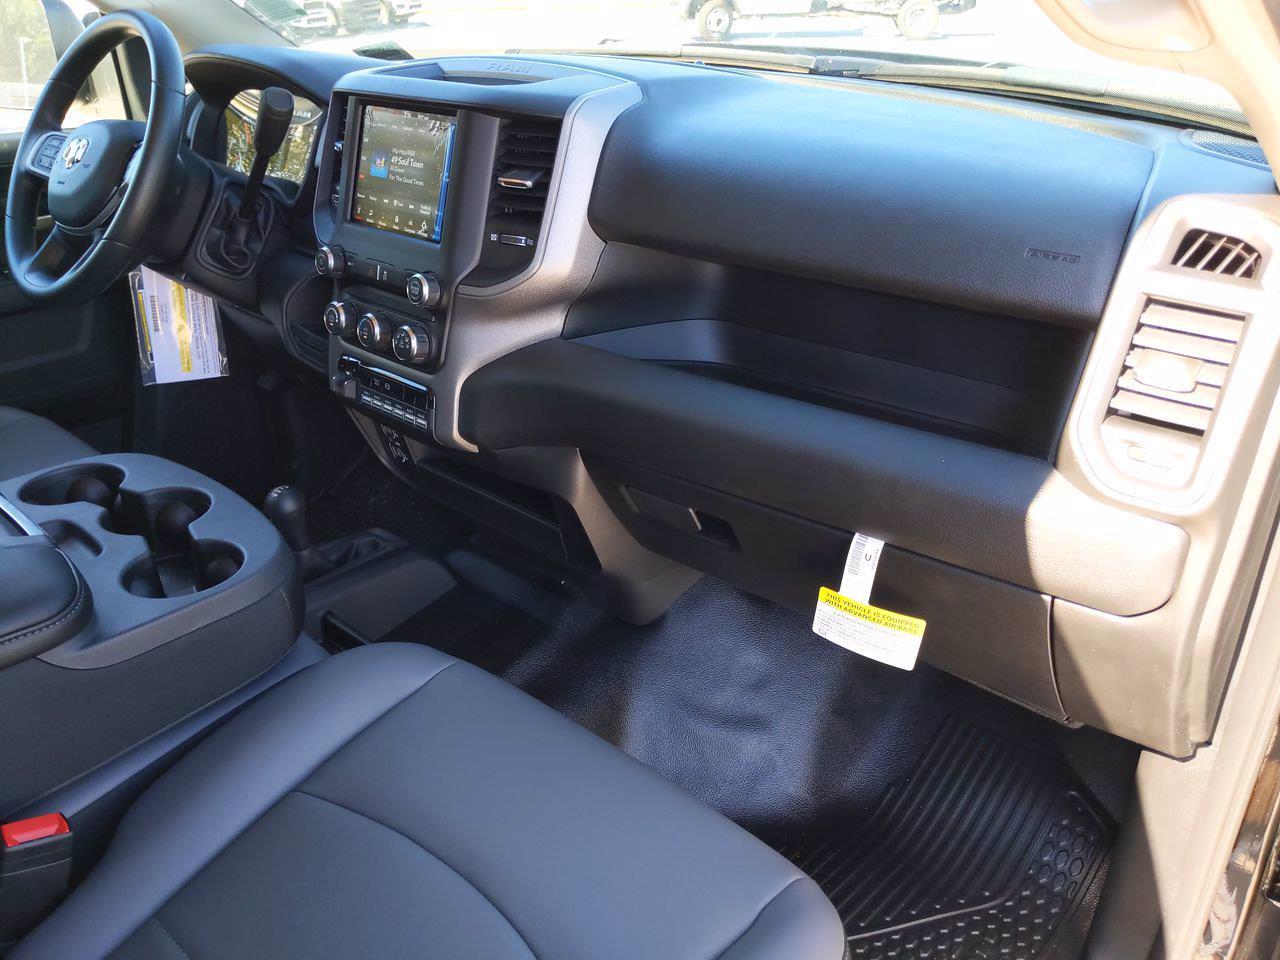 2020 Ram 5500 Crew Cab DRW 4x4, Cab Chassis #CL00174 - photo 20